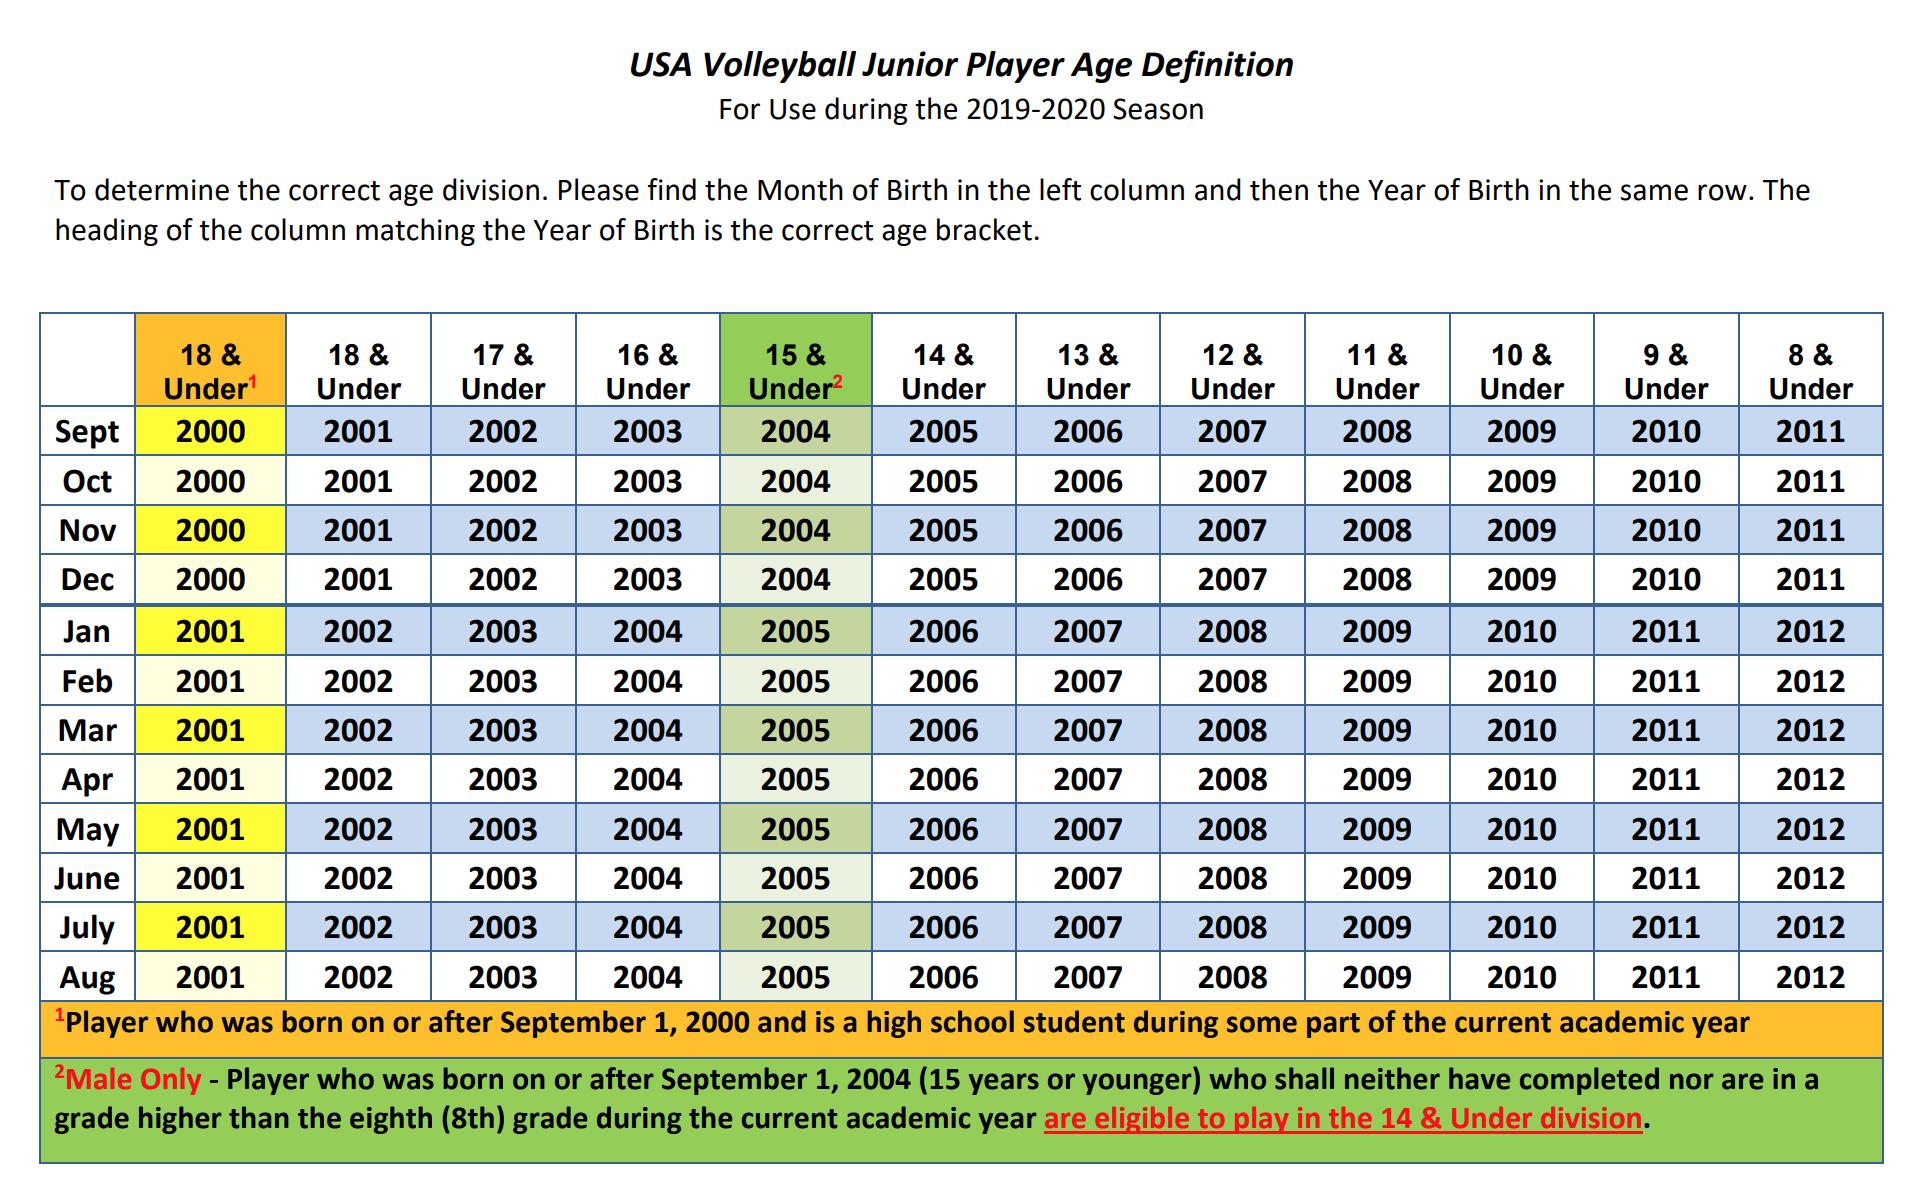 USAV Age Definition Chart 2019-2020